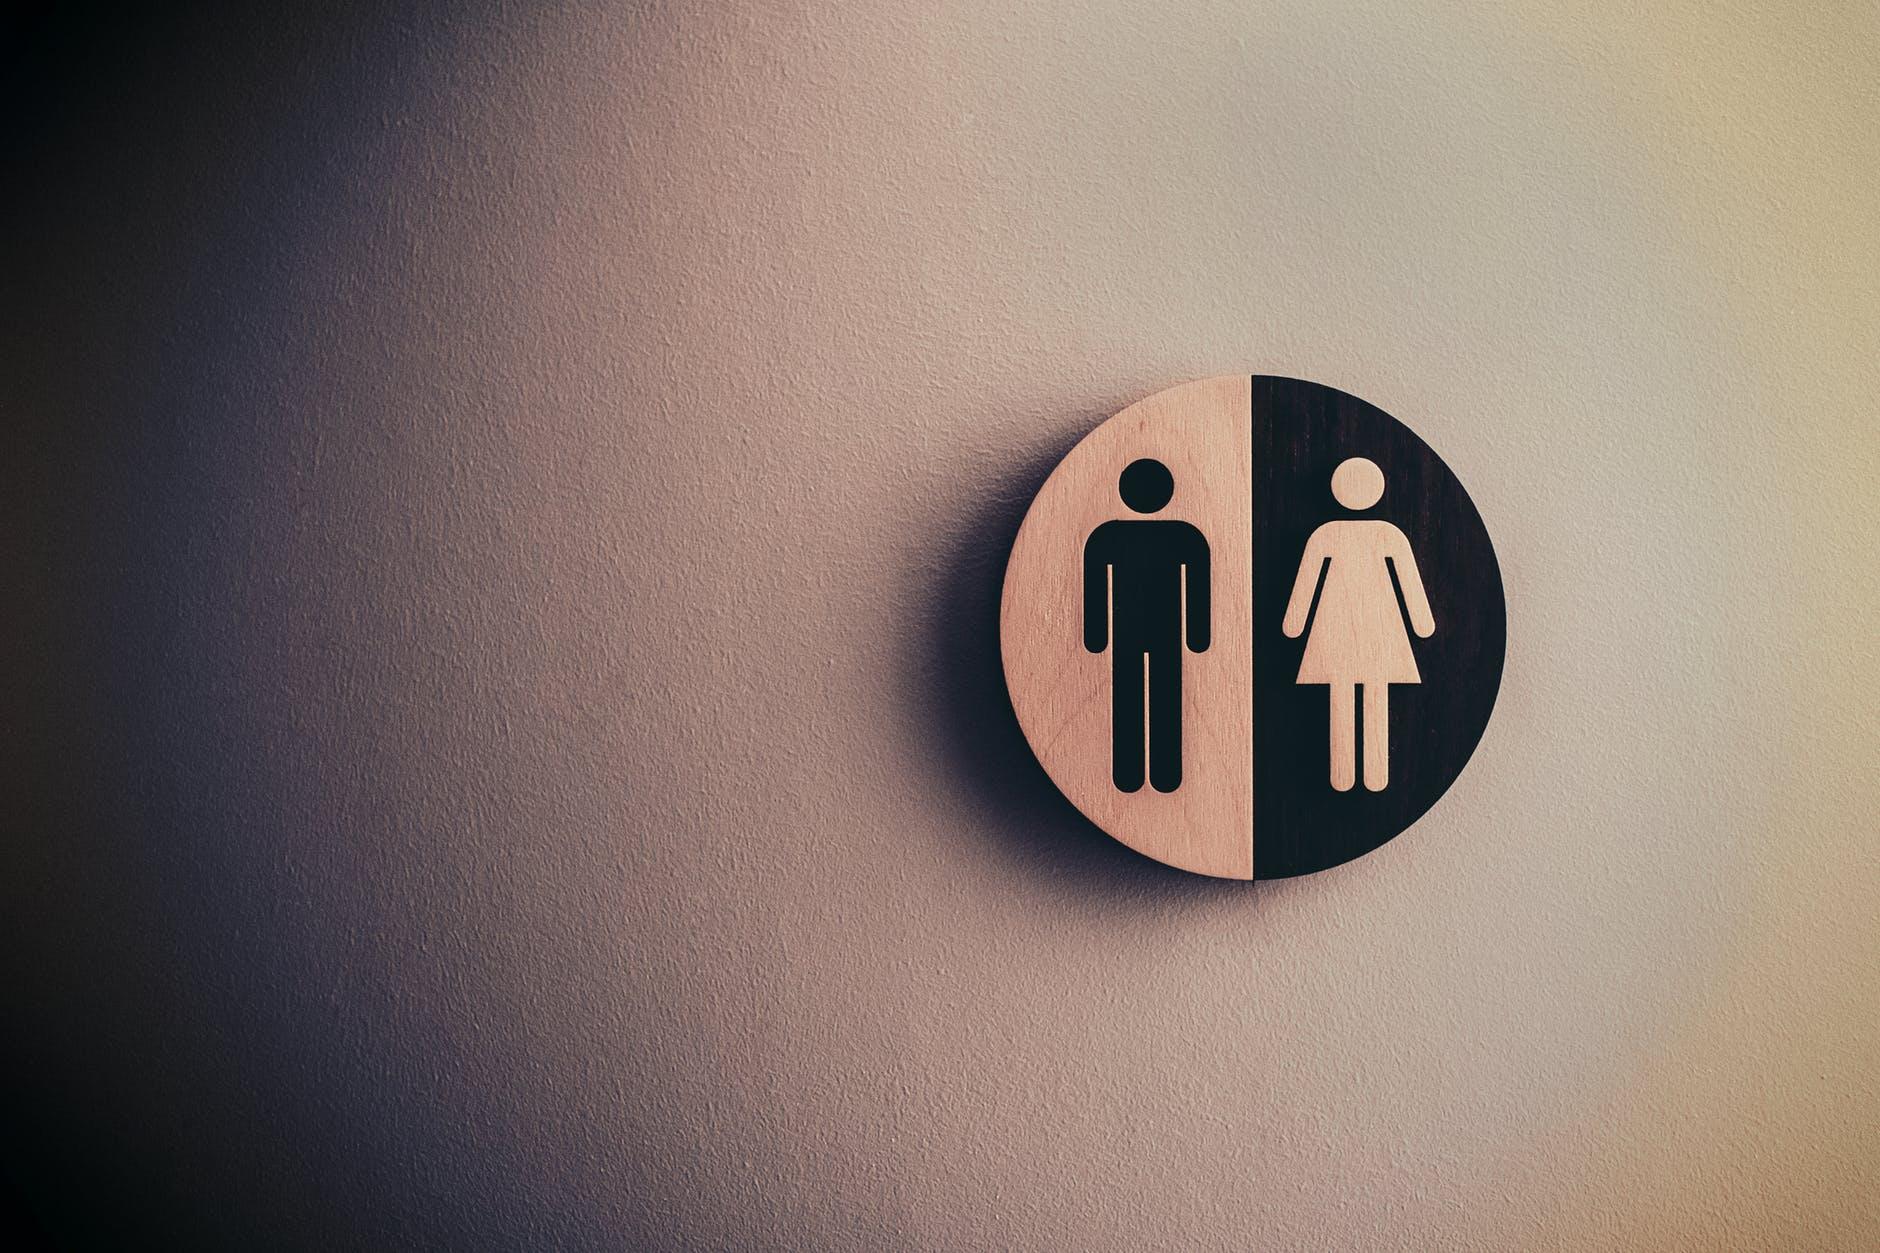 Desentupimento de vaso sanitário | Senador Camará | Desentupidora RJ